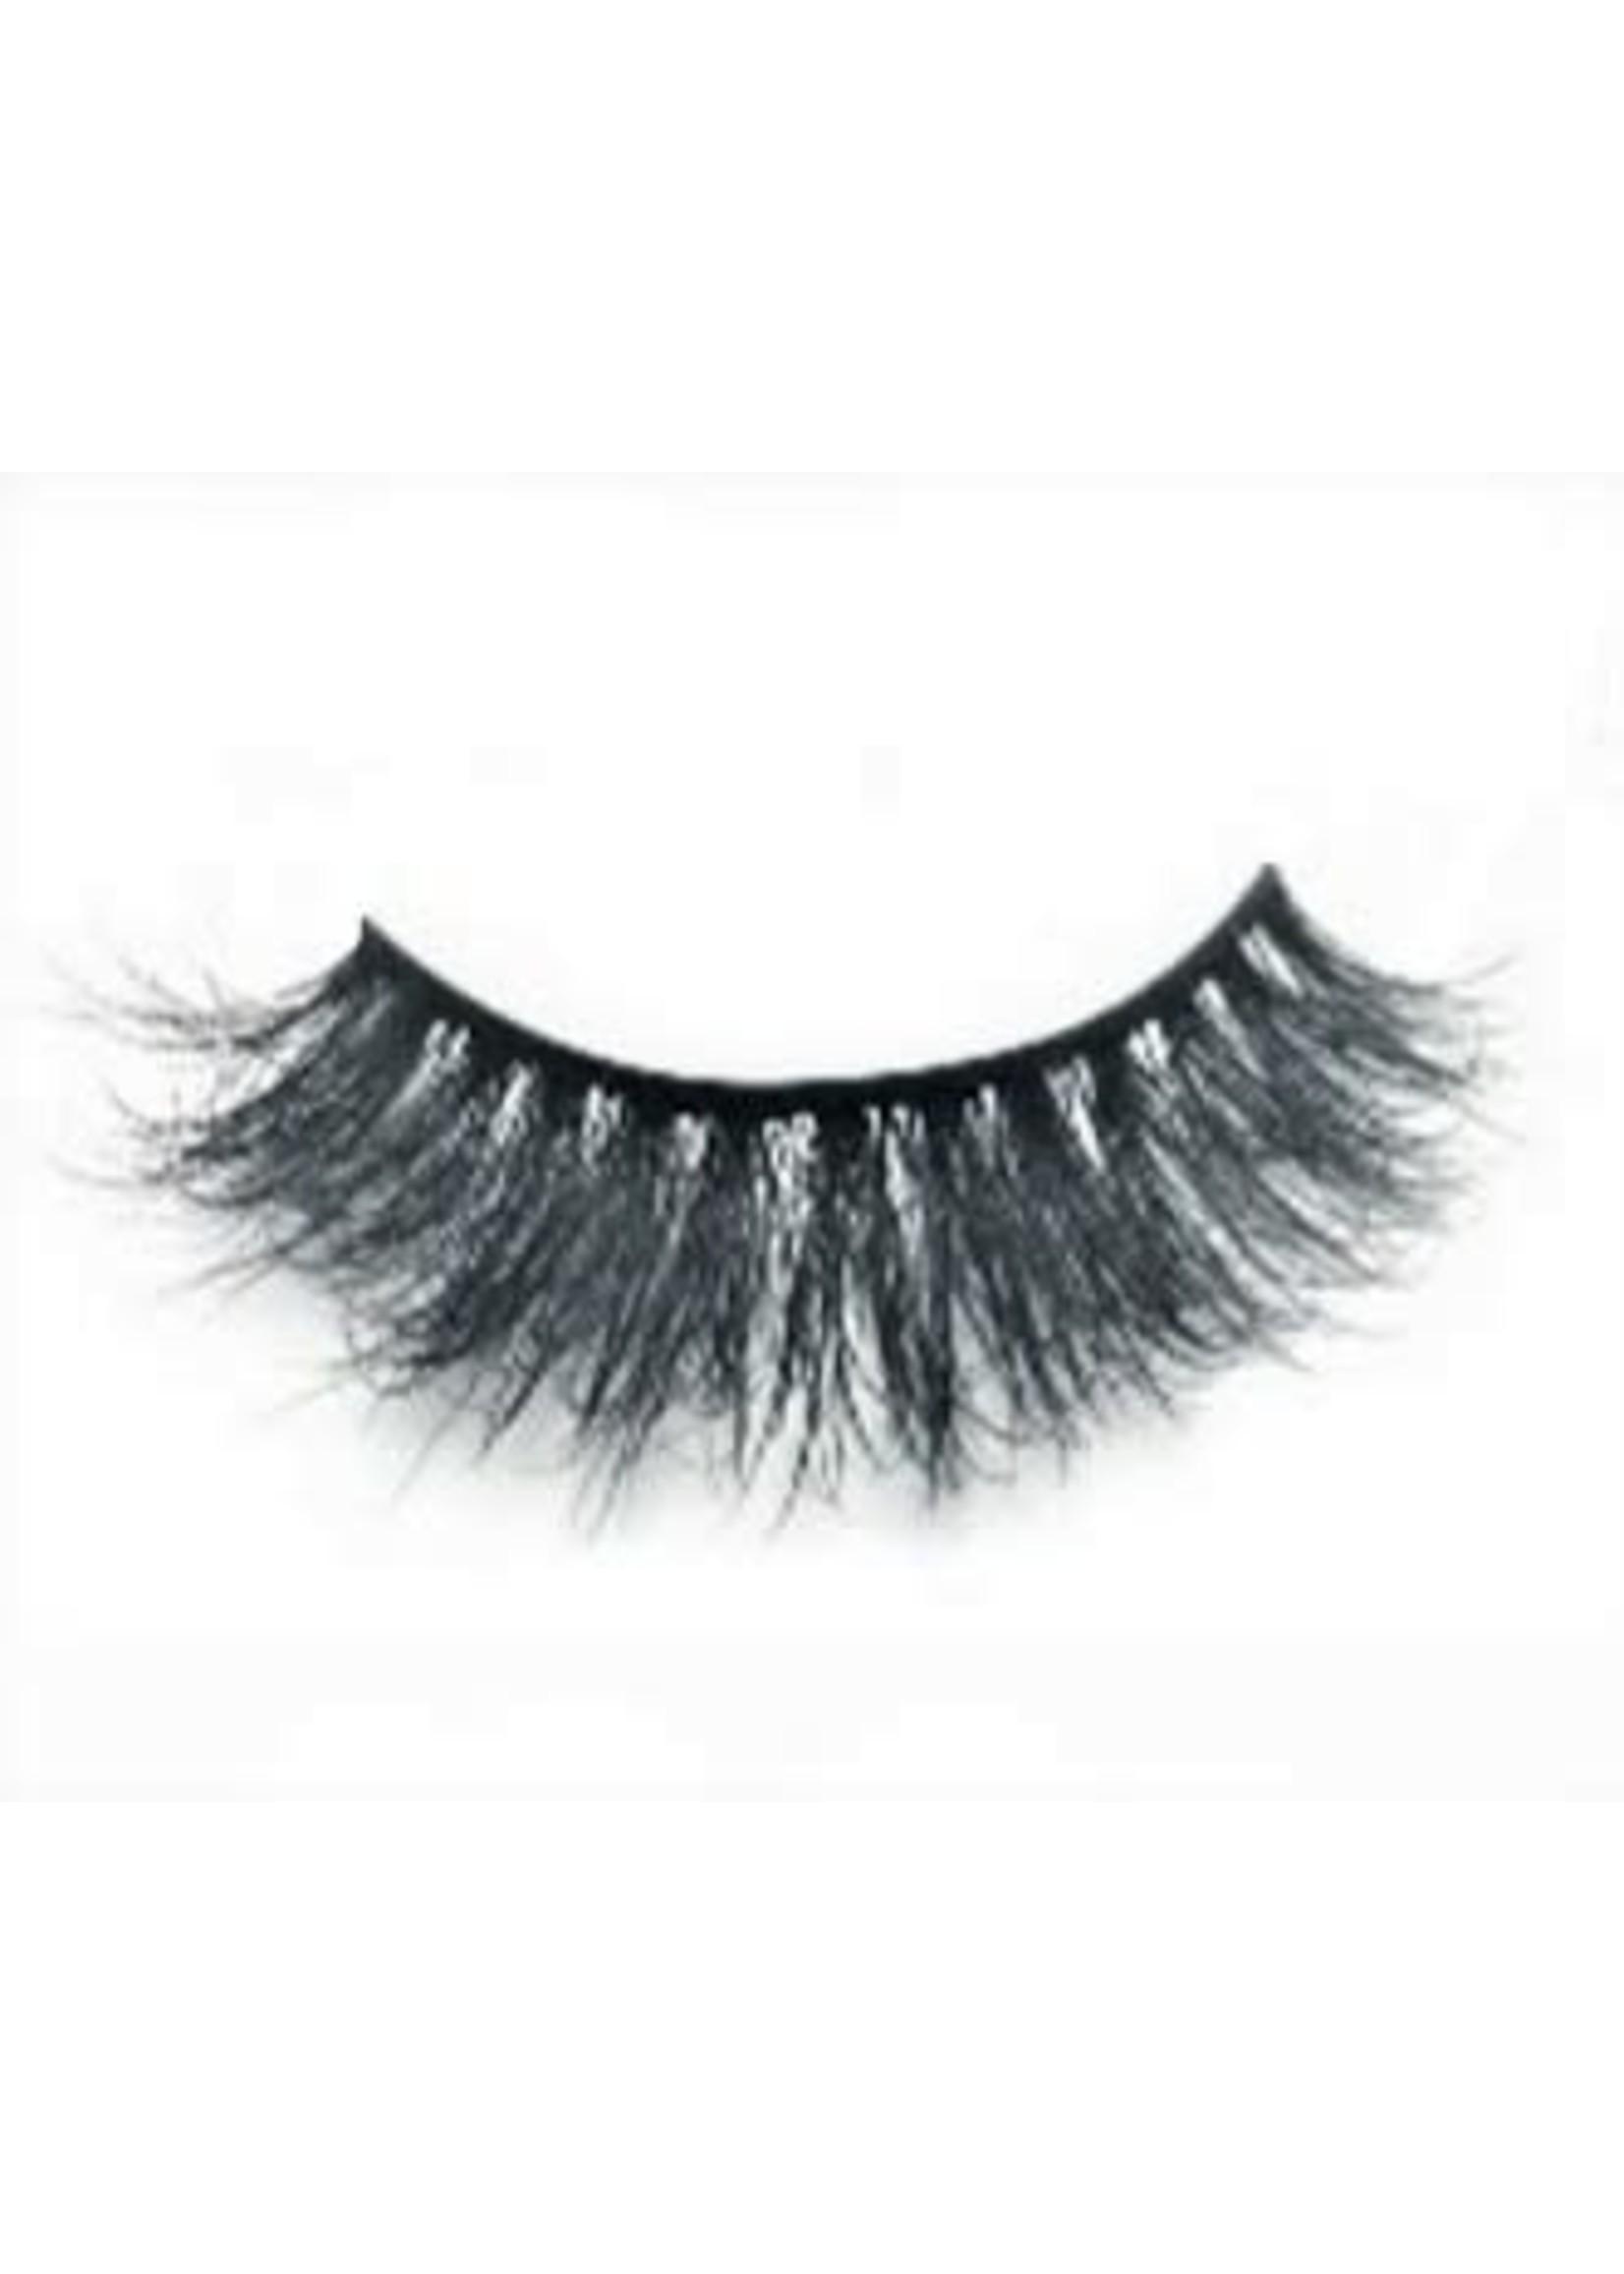 Mink Magnetic Eyelashes Delicate 520s